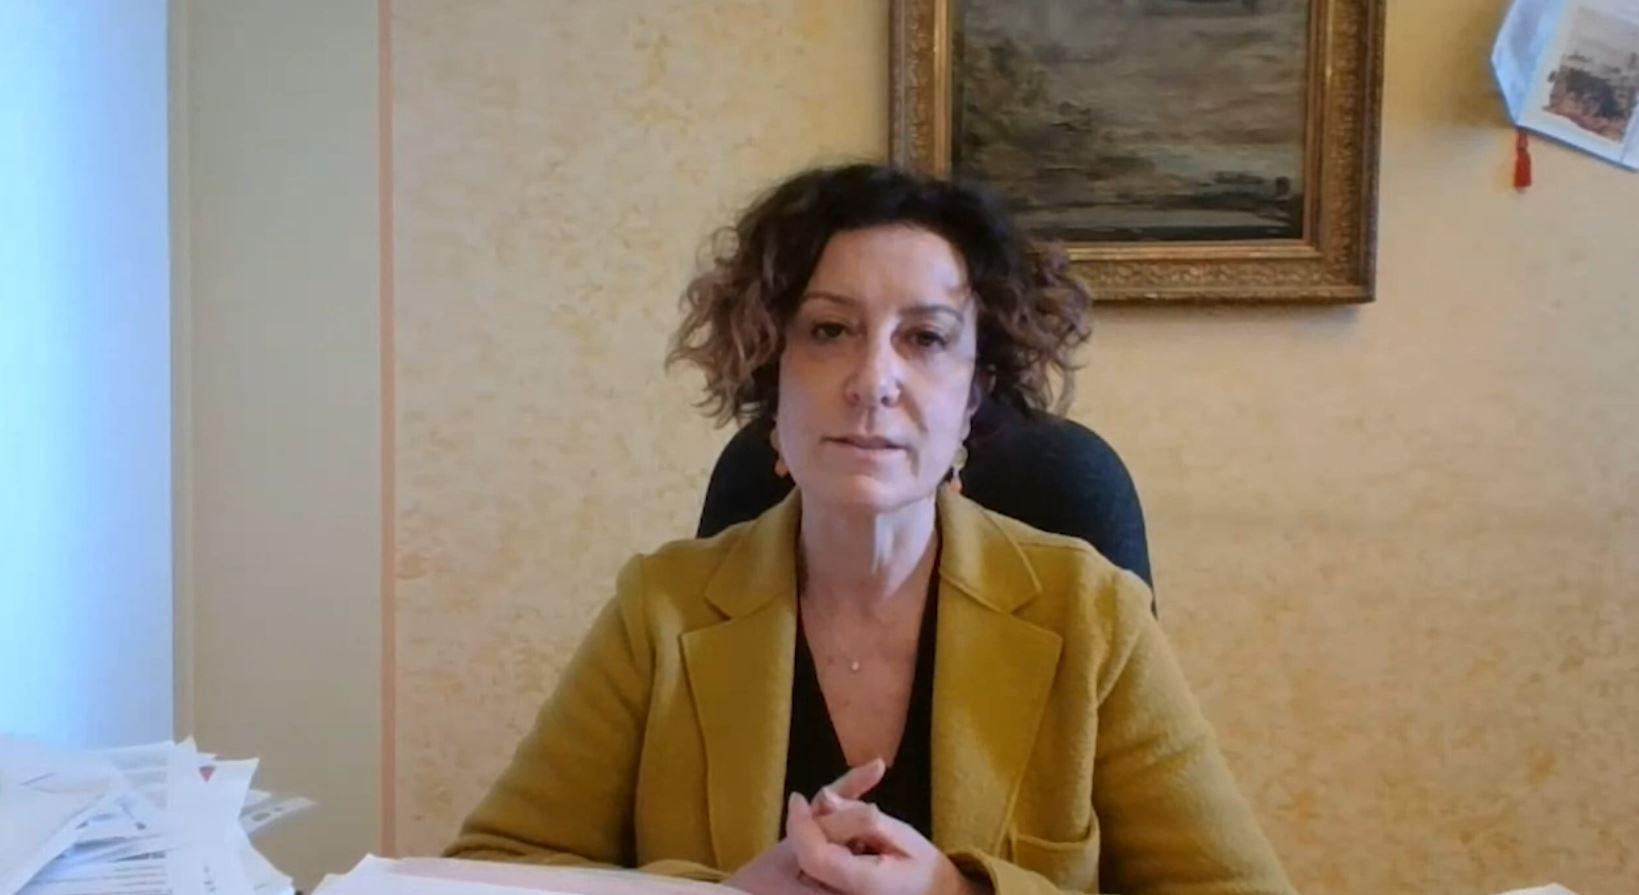 Denise Signorelli, direttrice sanitaria Ulss 9 Scaligera